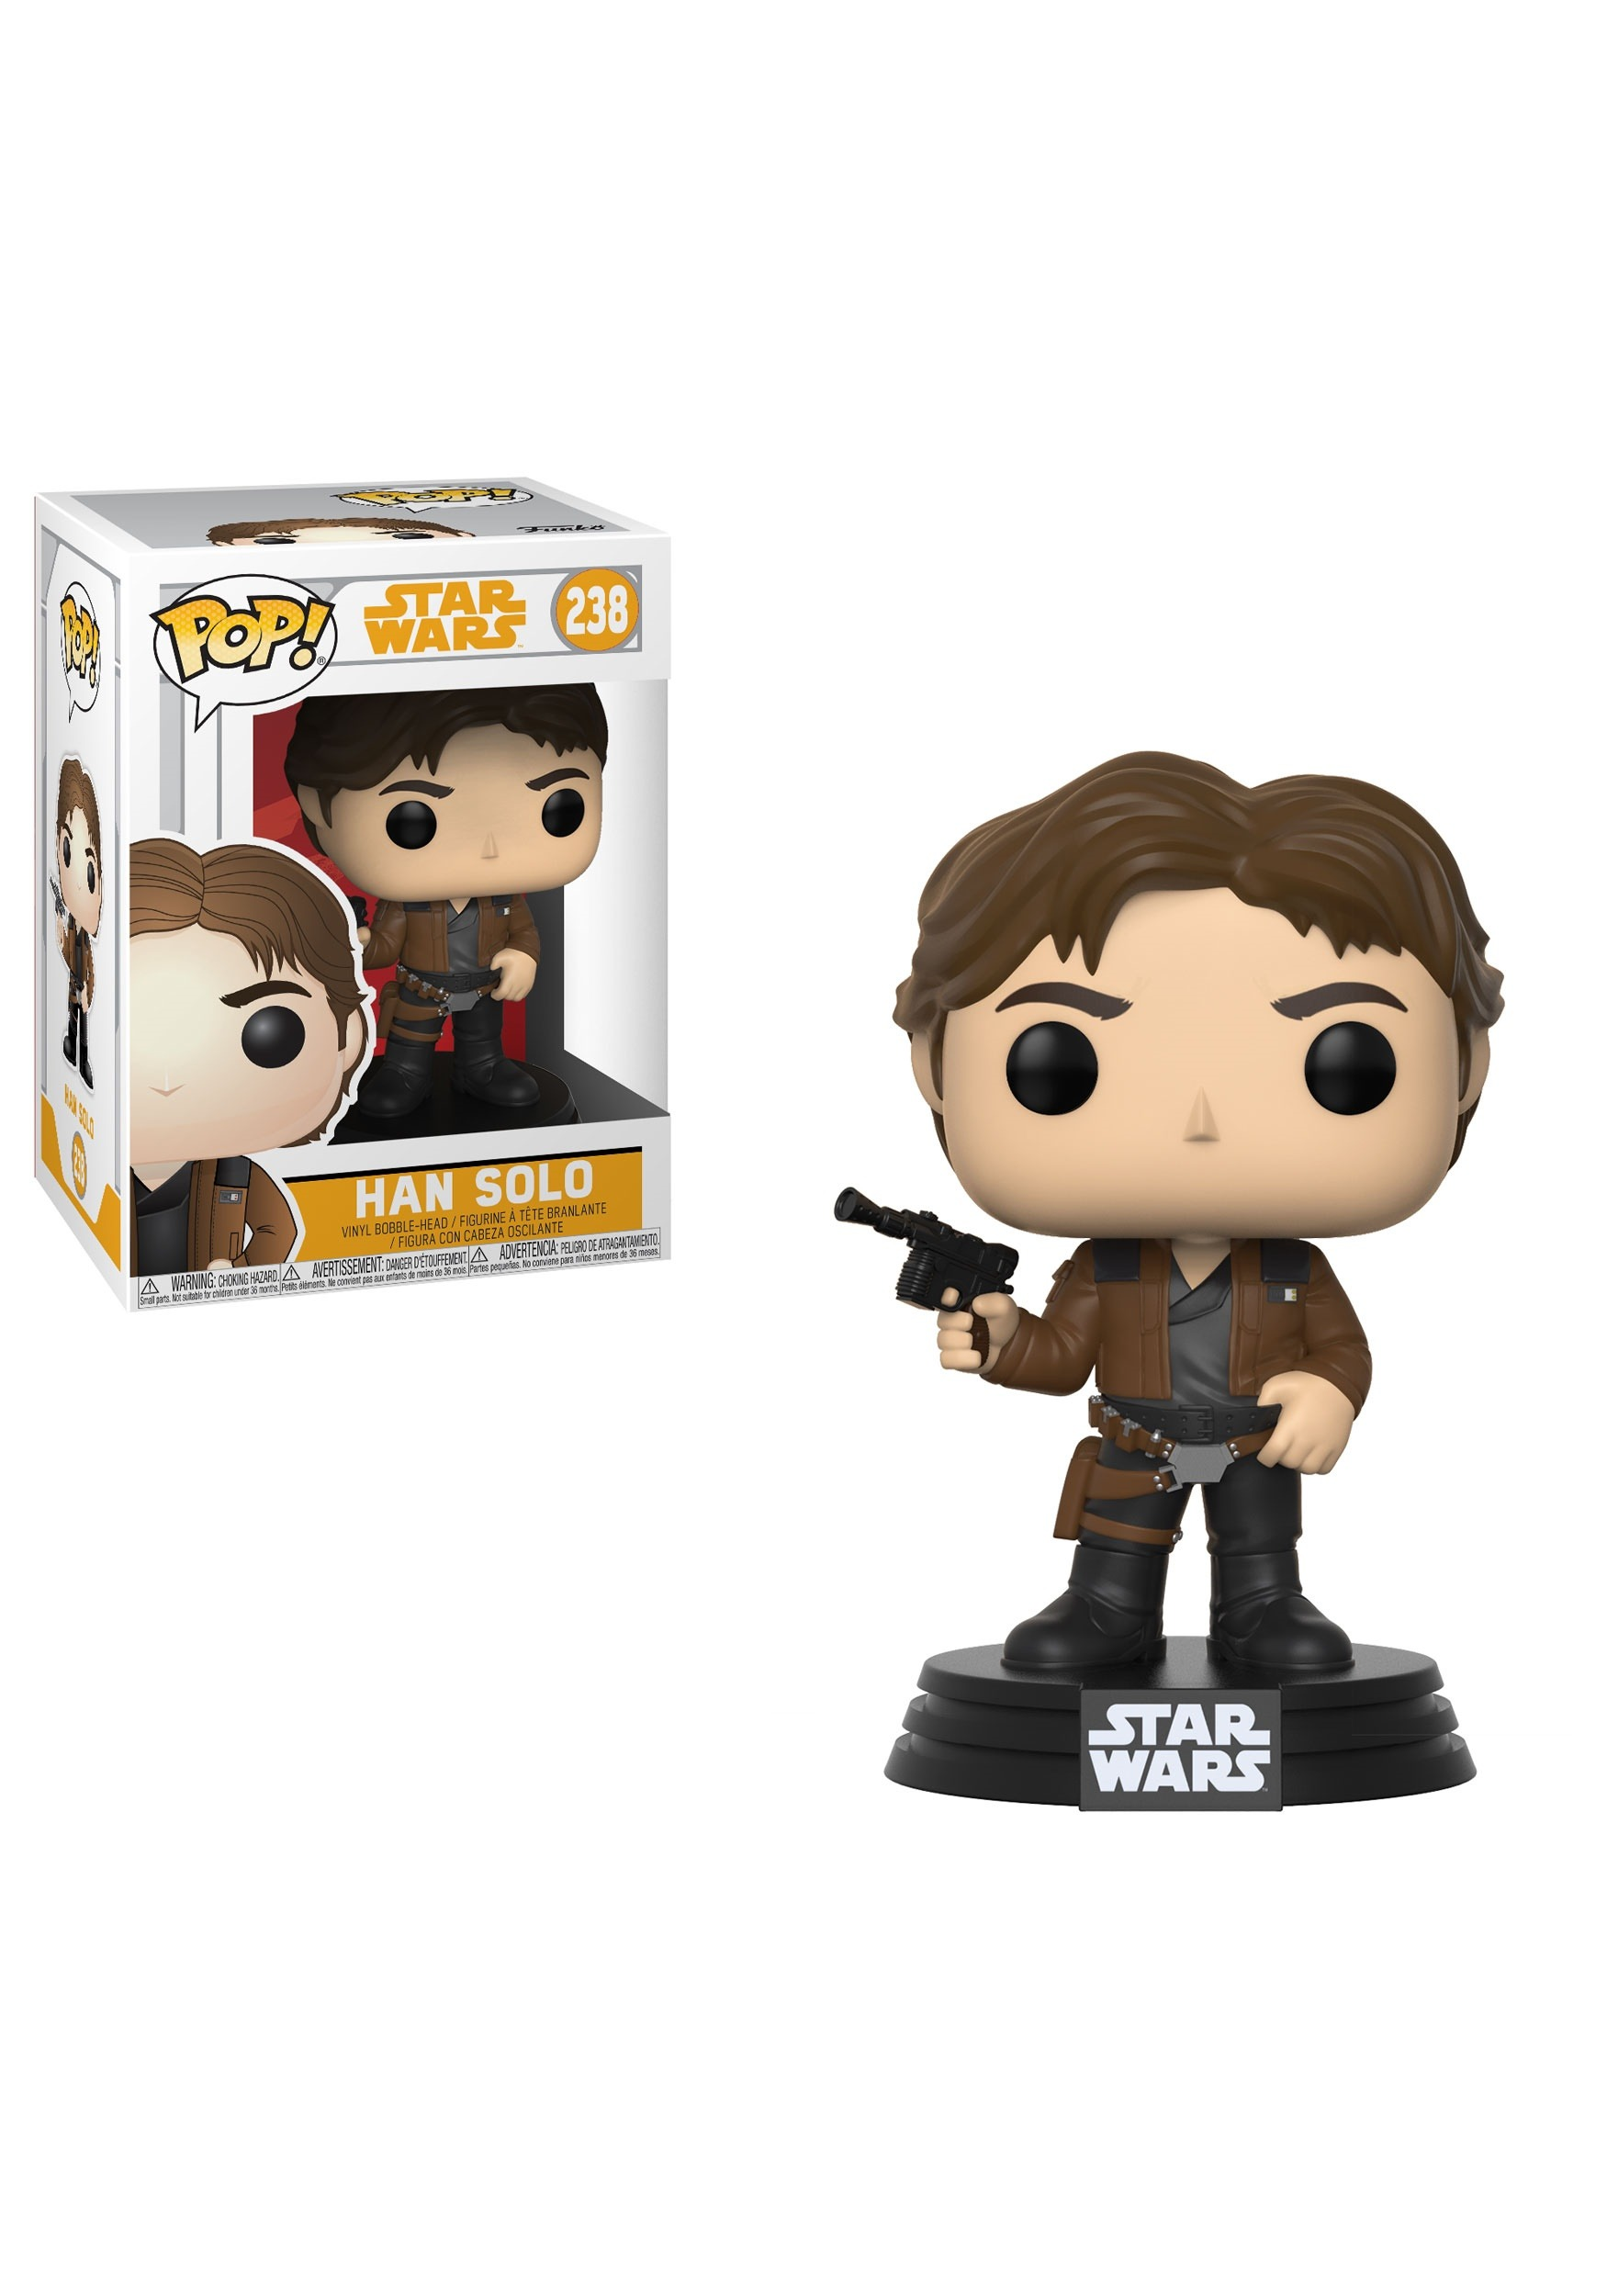 Pop Star Wars Solo Bobblehead Figure Han Solo Movie-5988